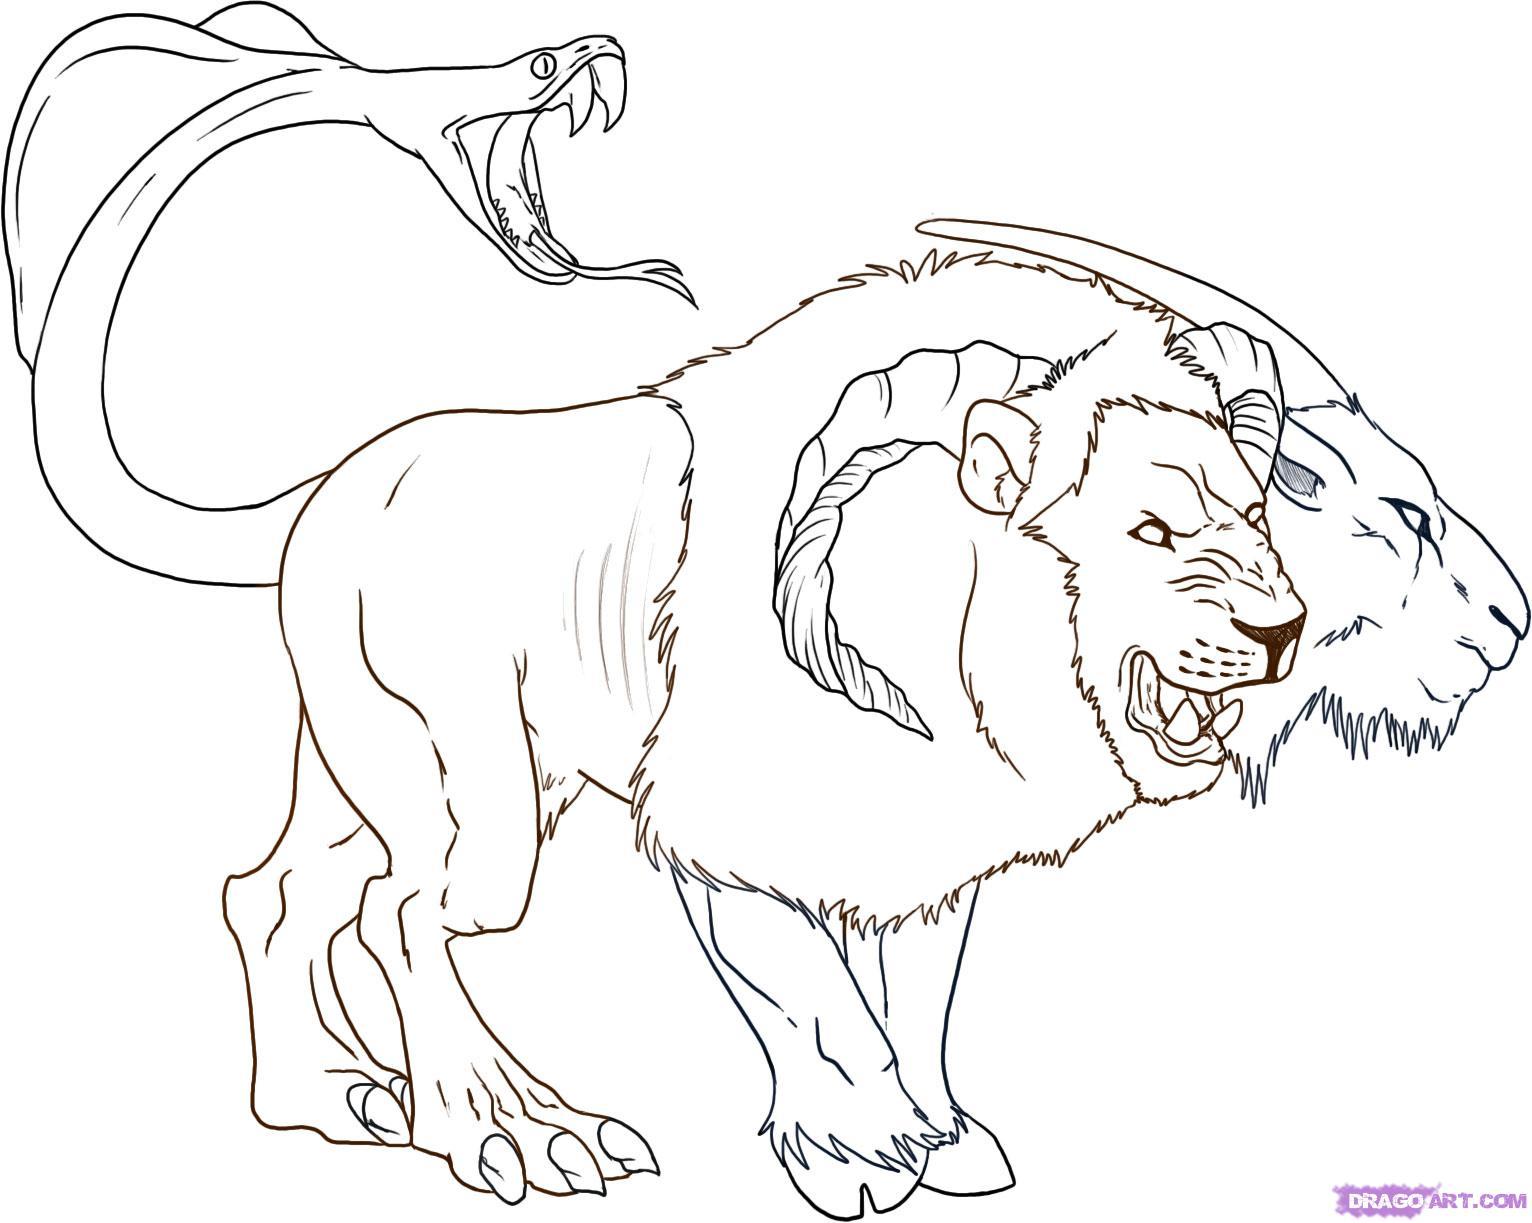 Chimera coloring #5, Download drawings